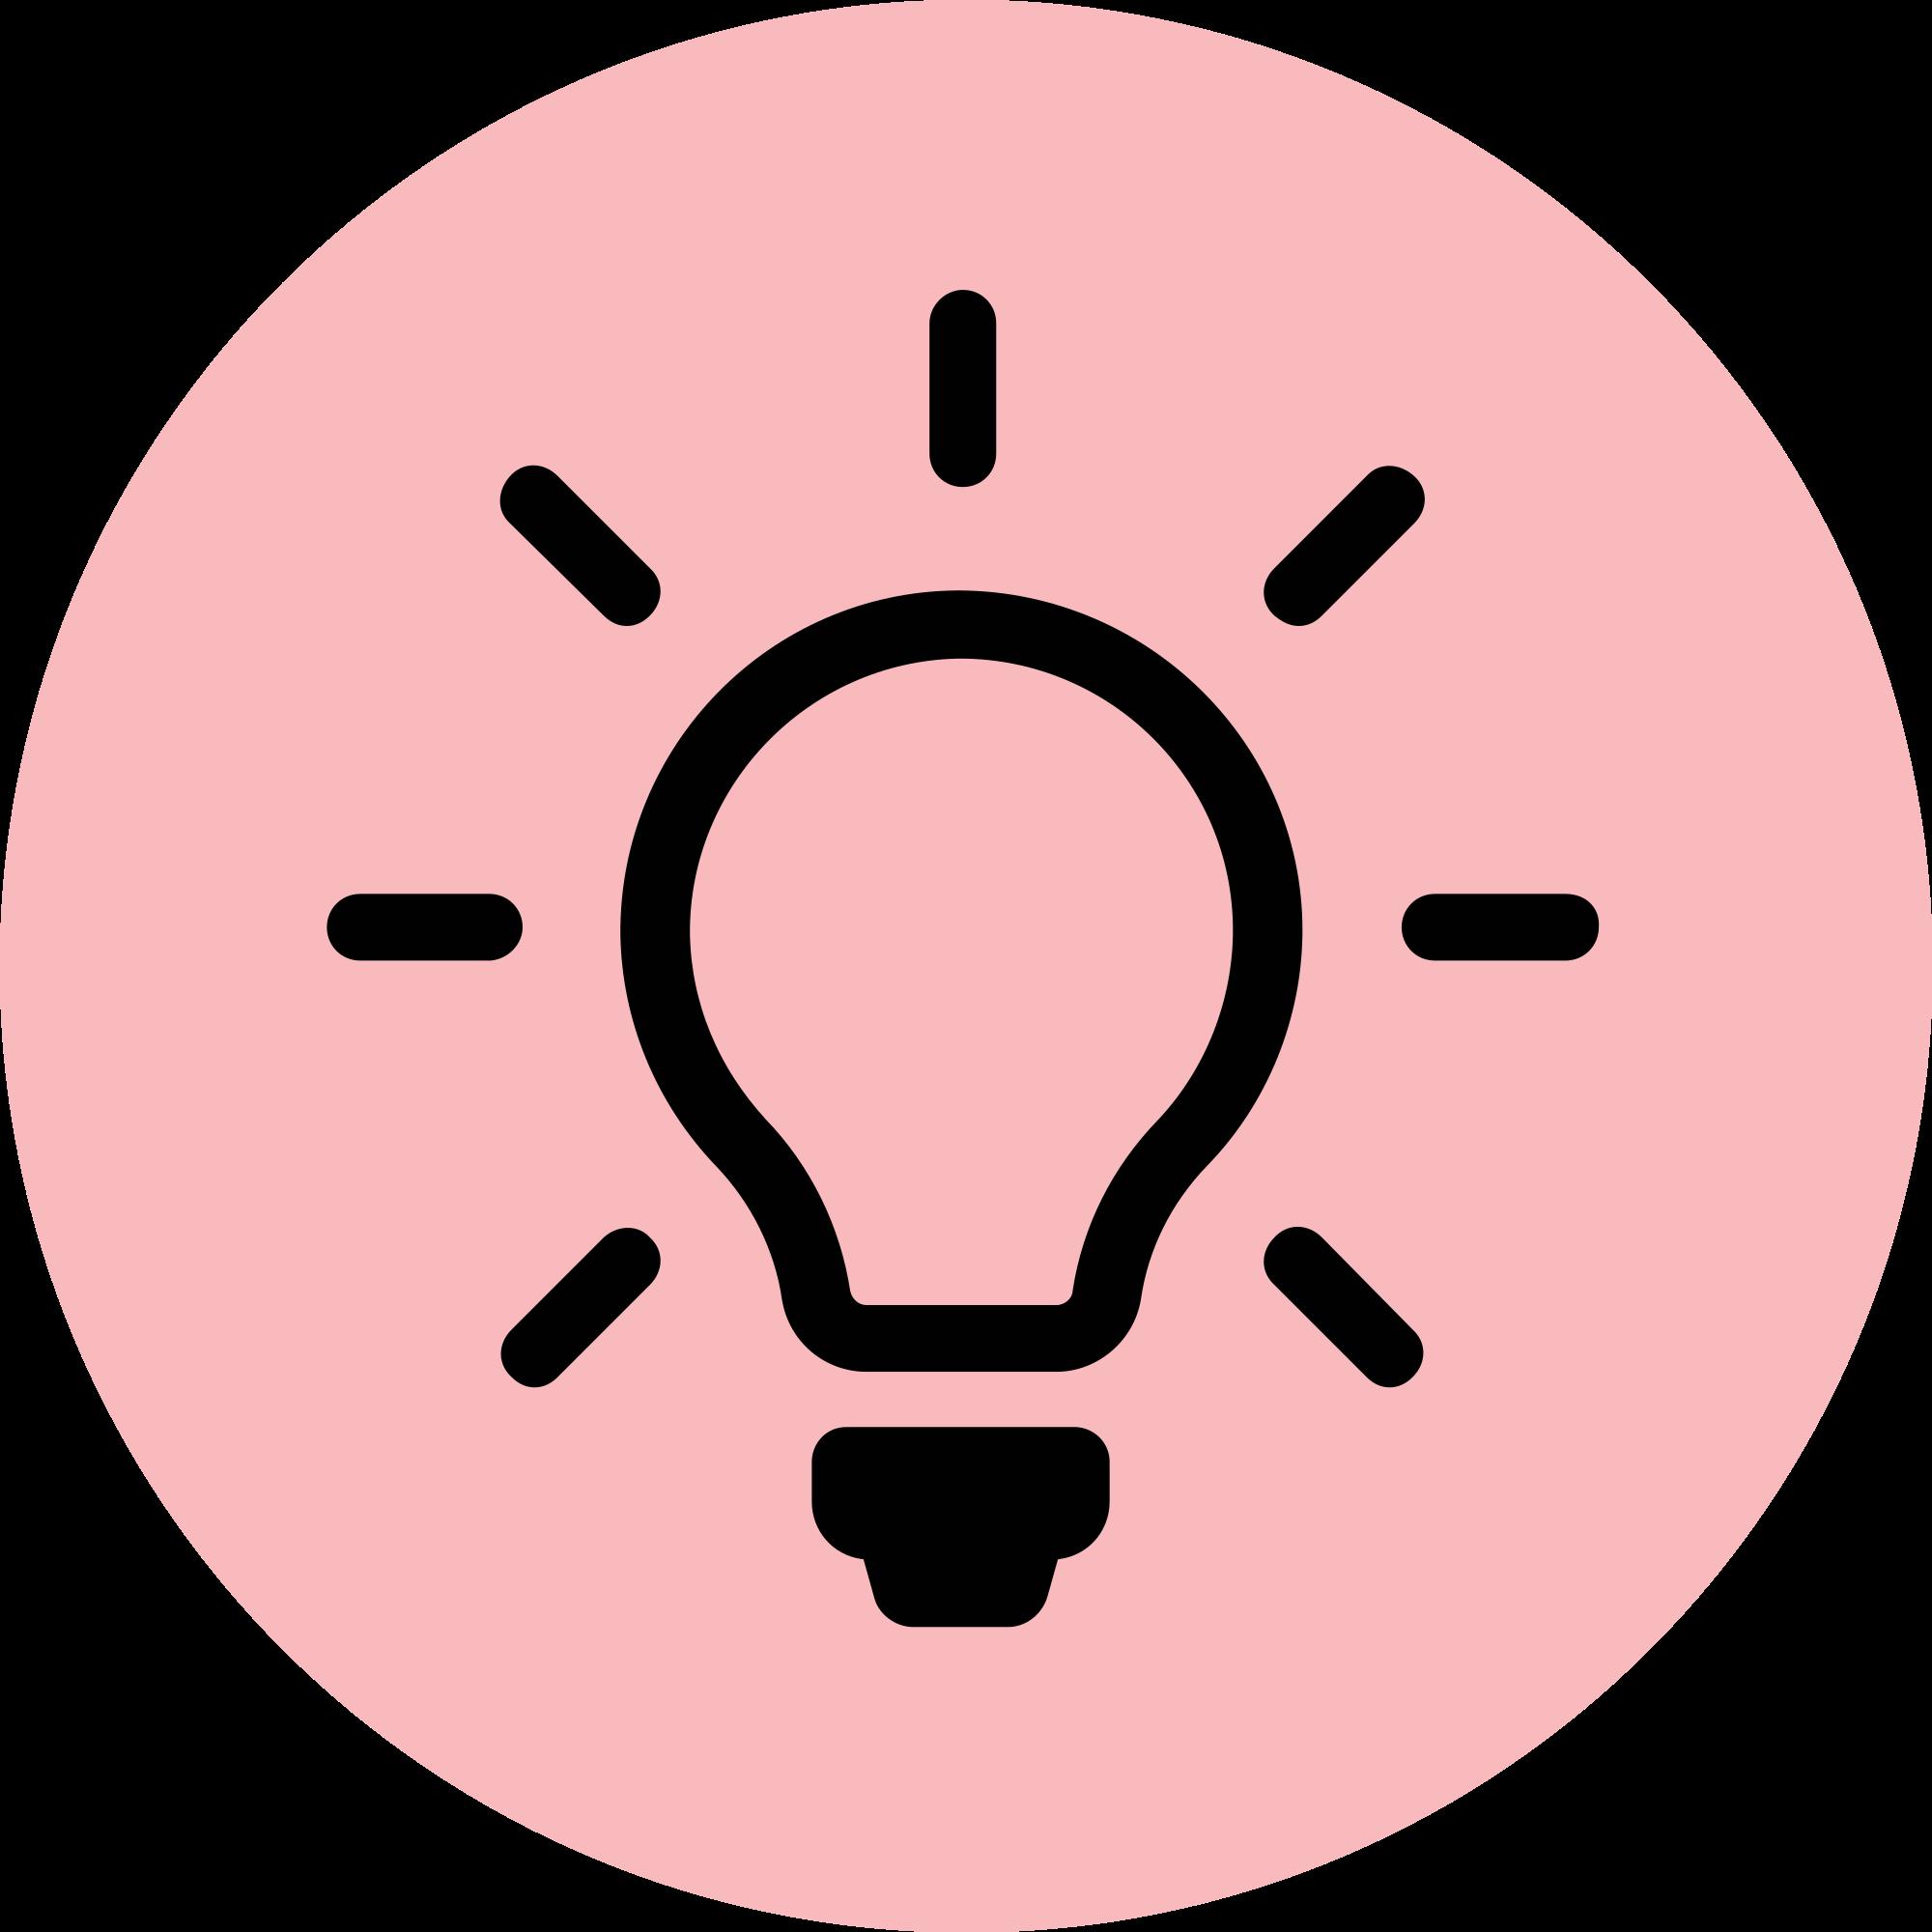 Lightbulb clipart pink. File light bulb icon